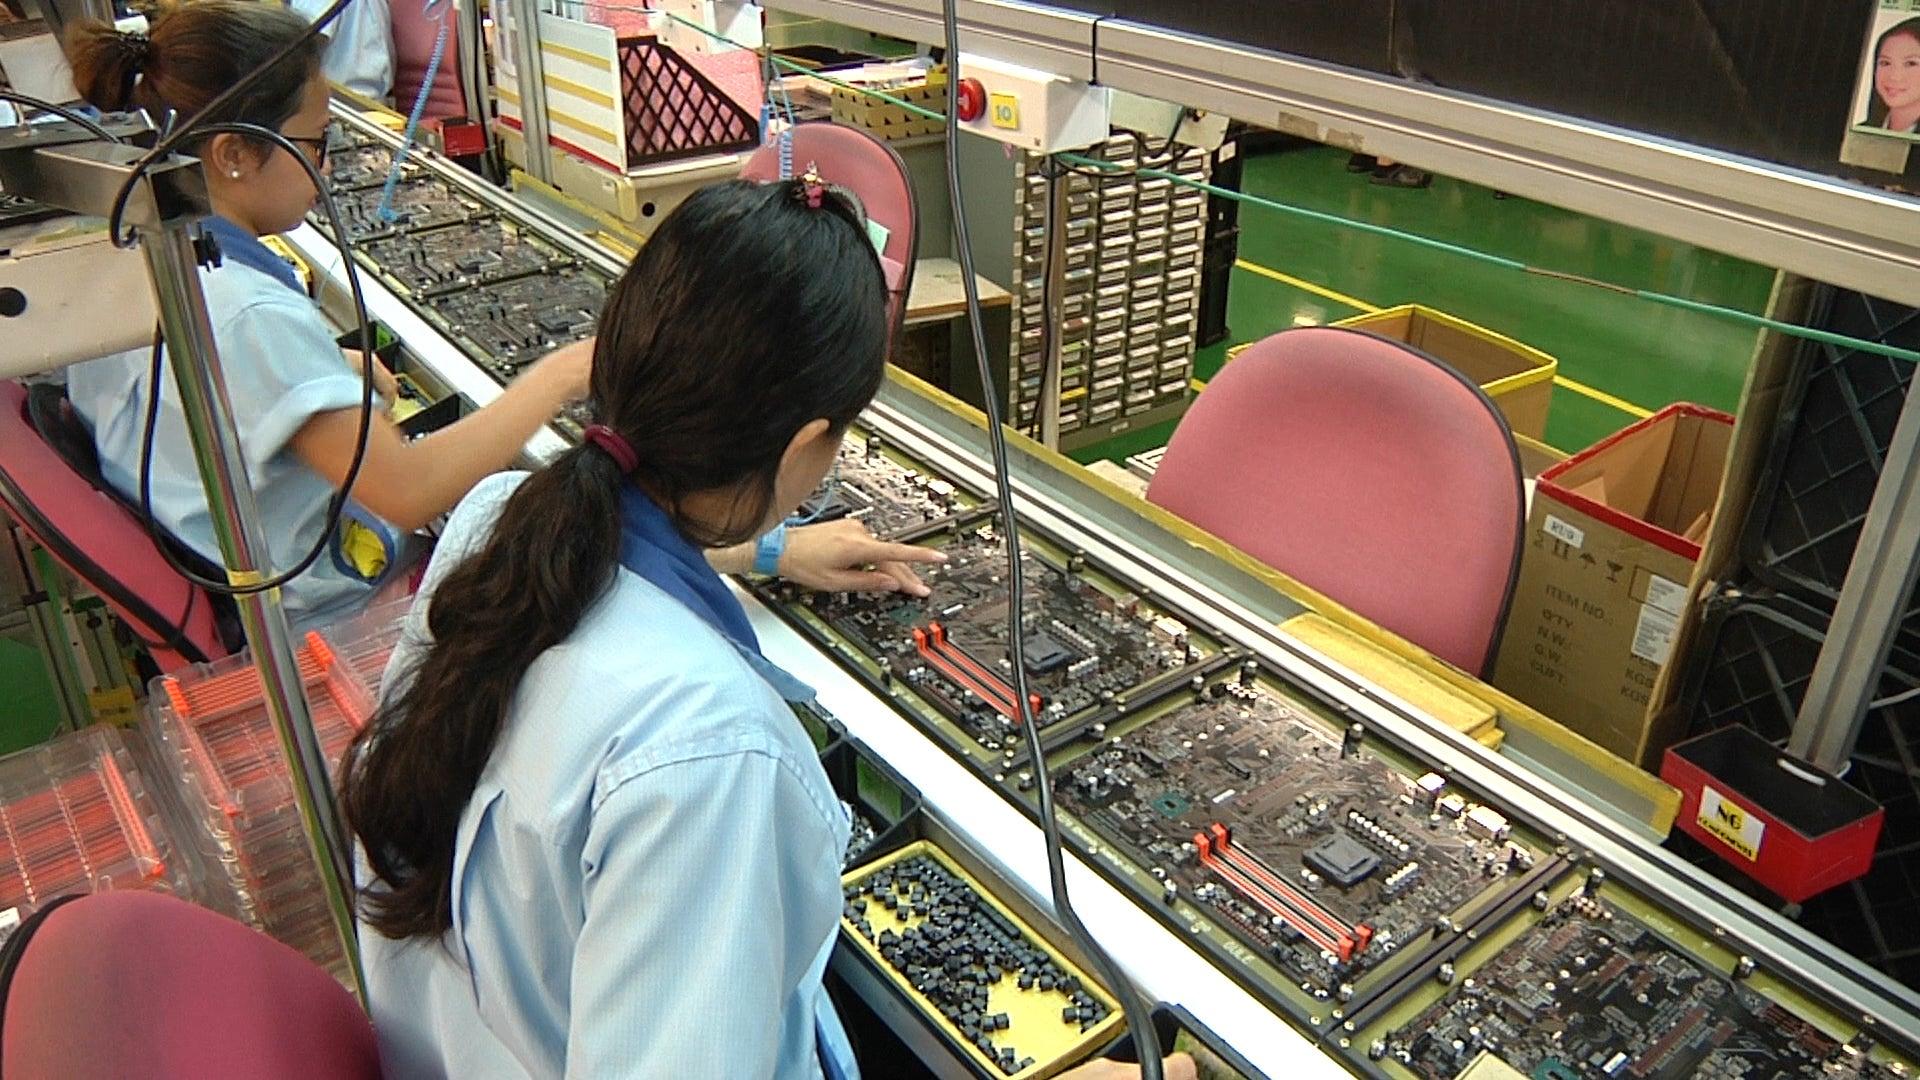 gigabyte motherboard factory